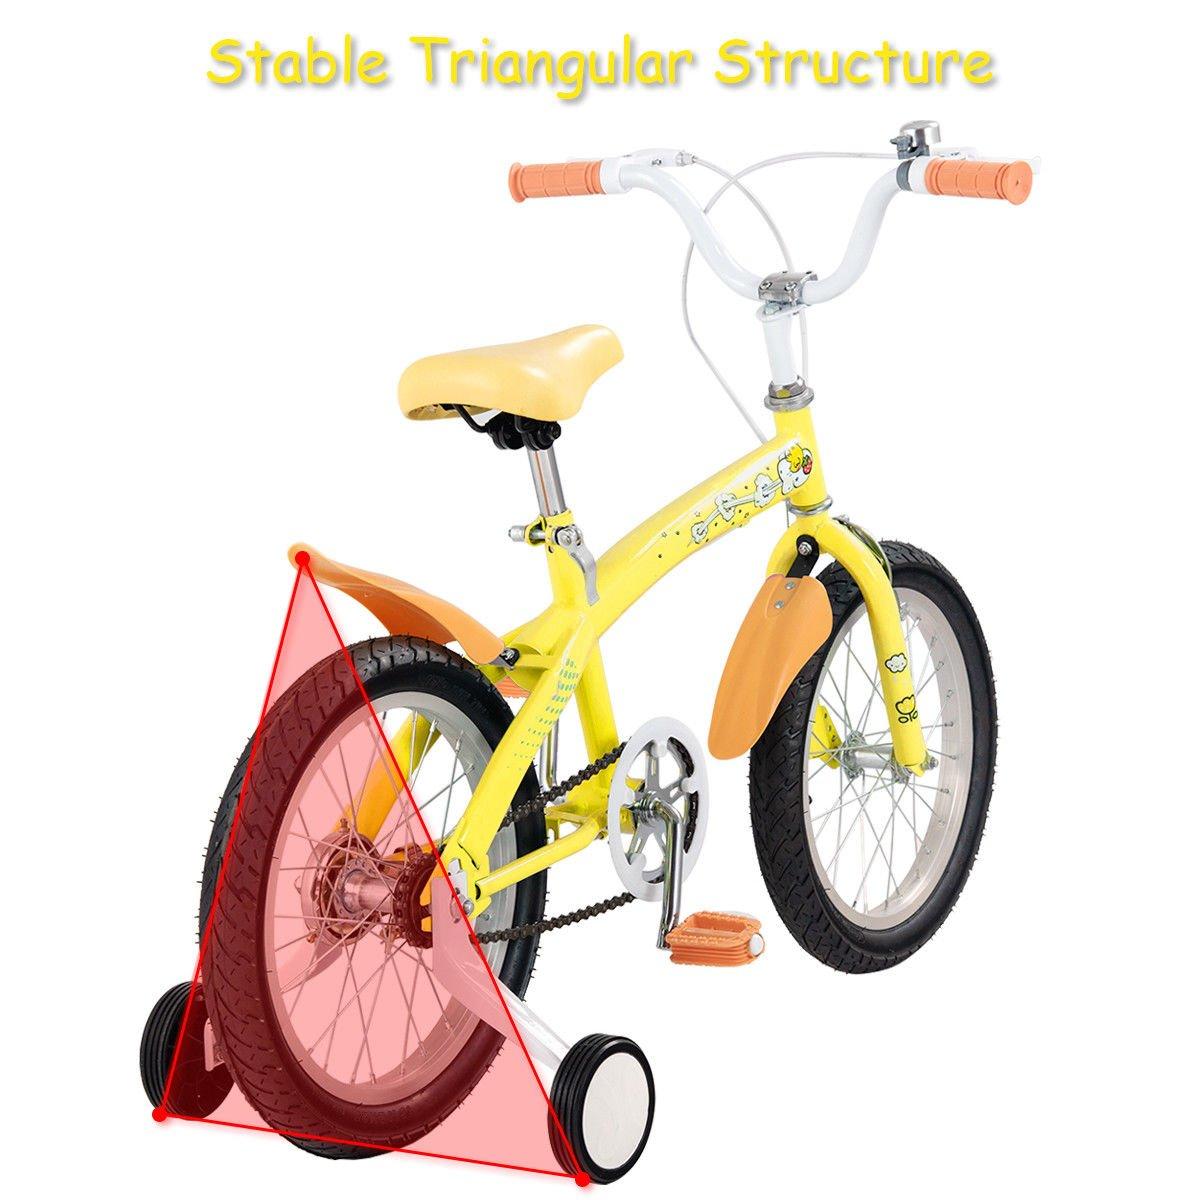 FDInspiration Yellow 45'' x 31.5'' Metal Frame Kids Bike w/Training Wheels with Ebook by FDInspiration (Image #6)